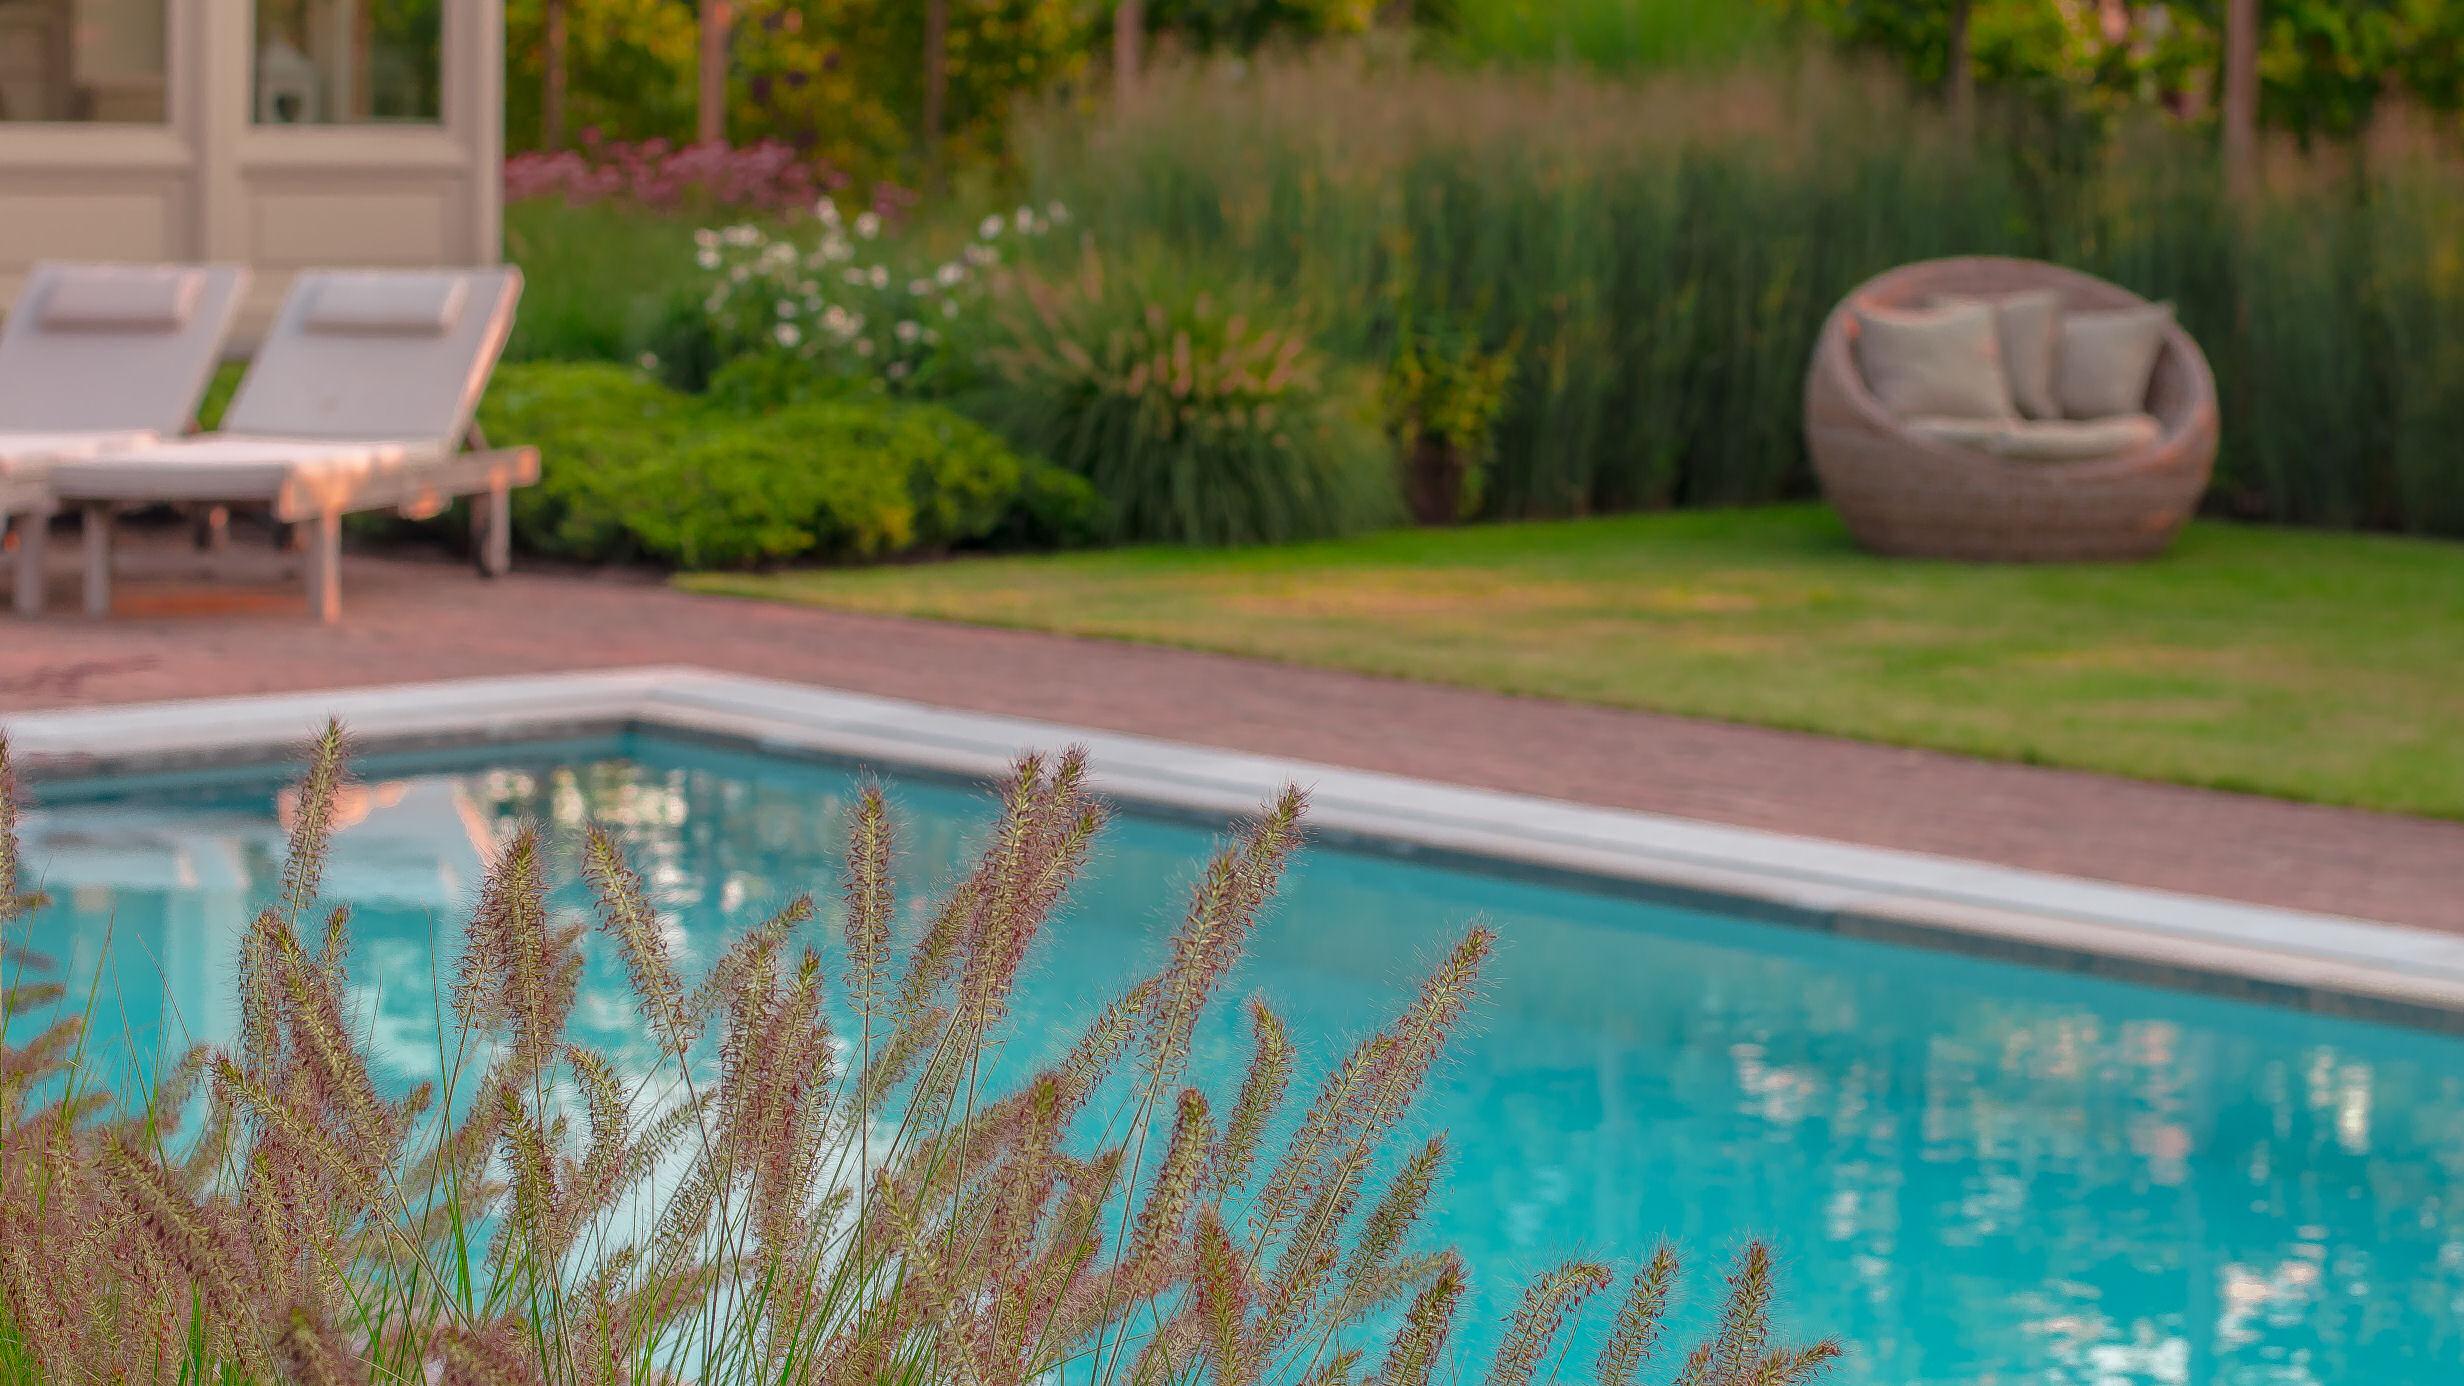 tuinontwerp, tuinaanleg, zwembad, tuinarchitect, tuinaannemer